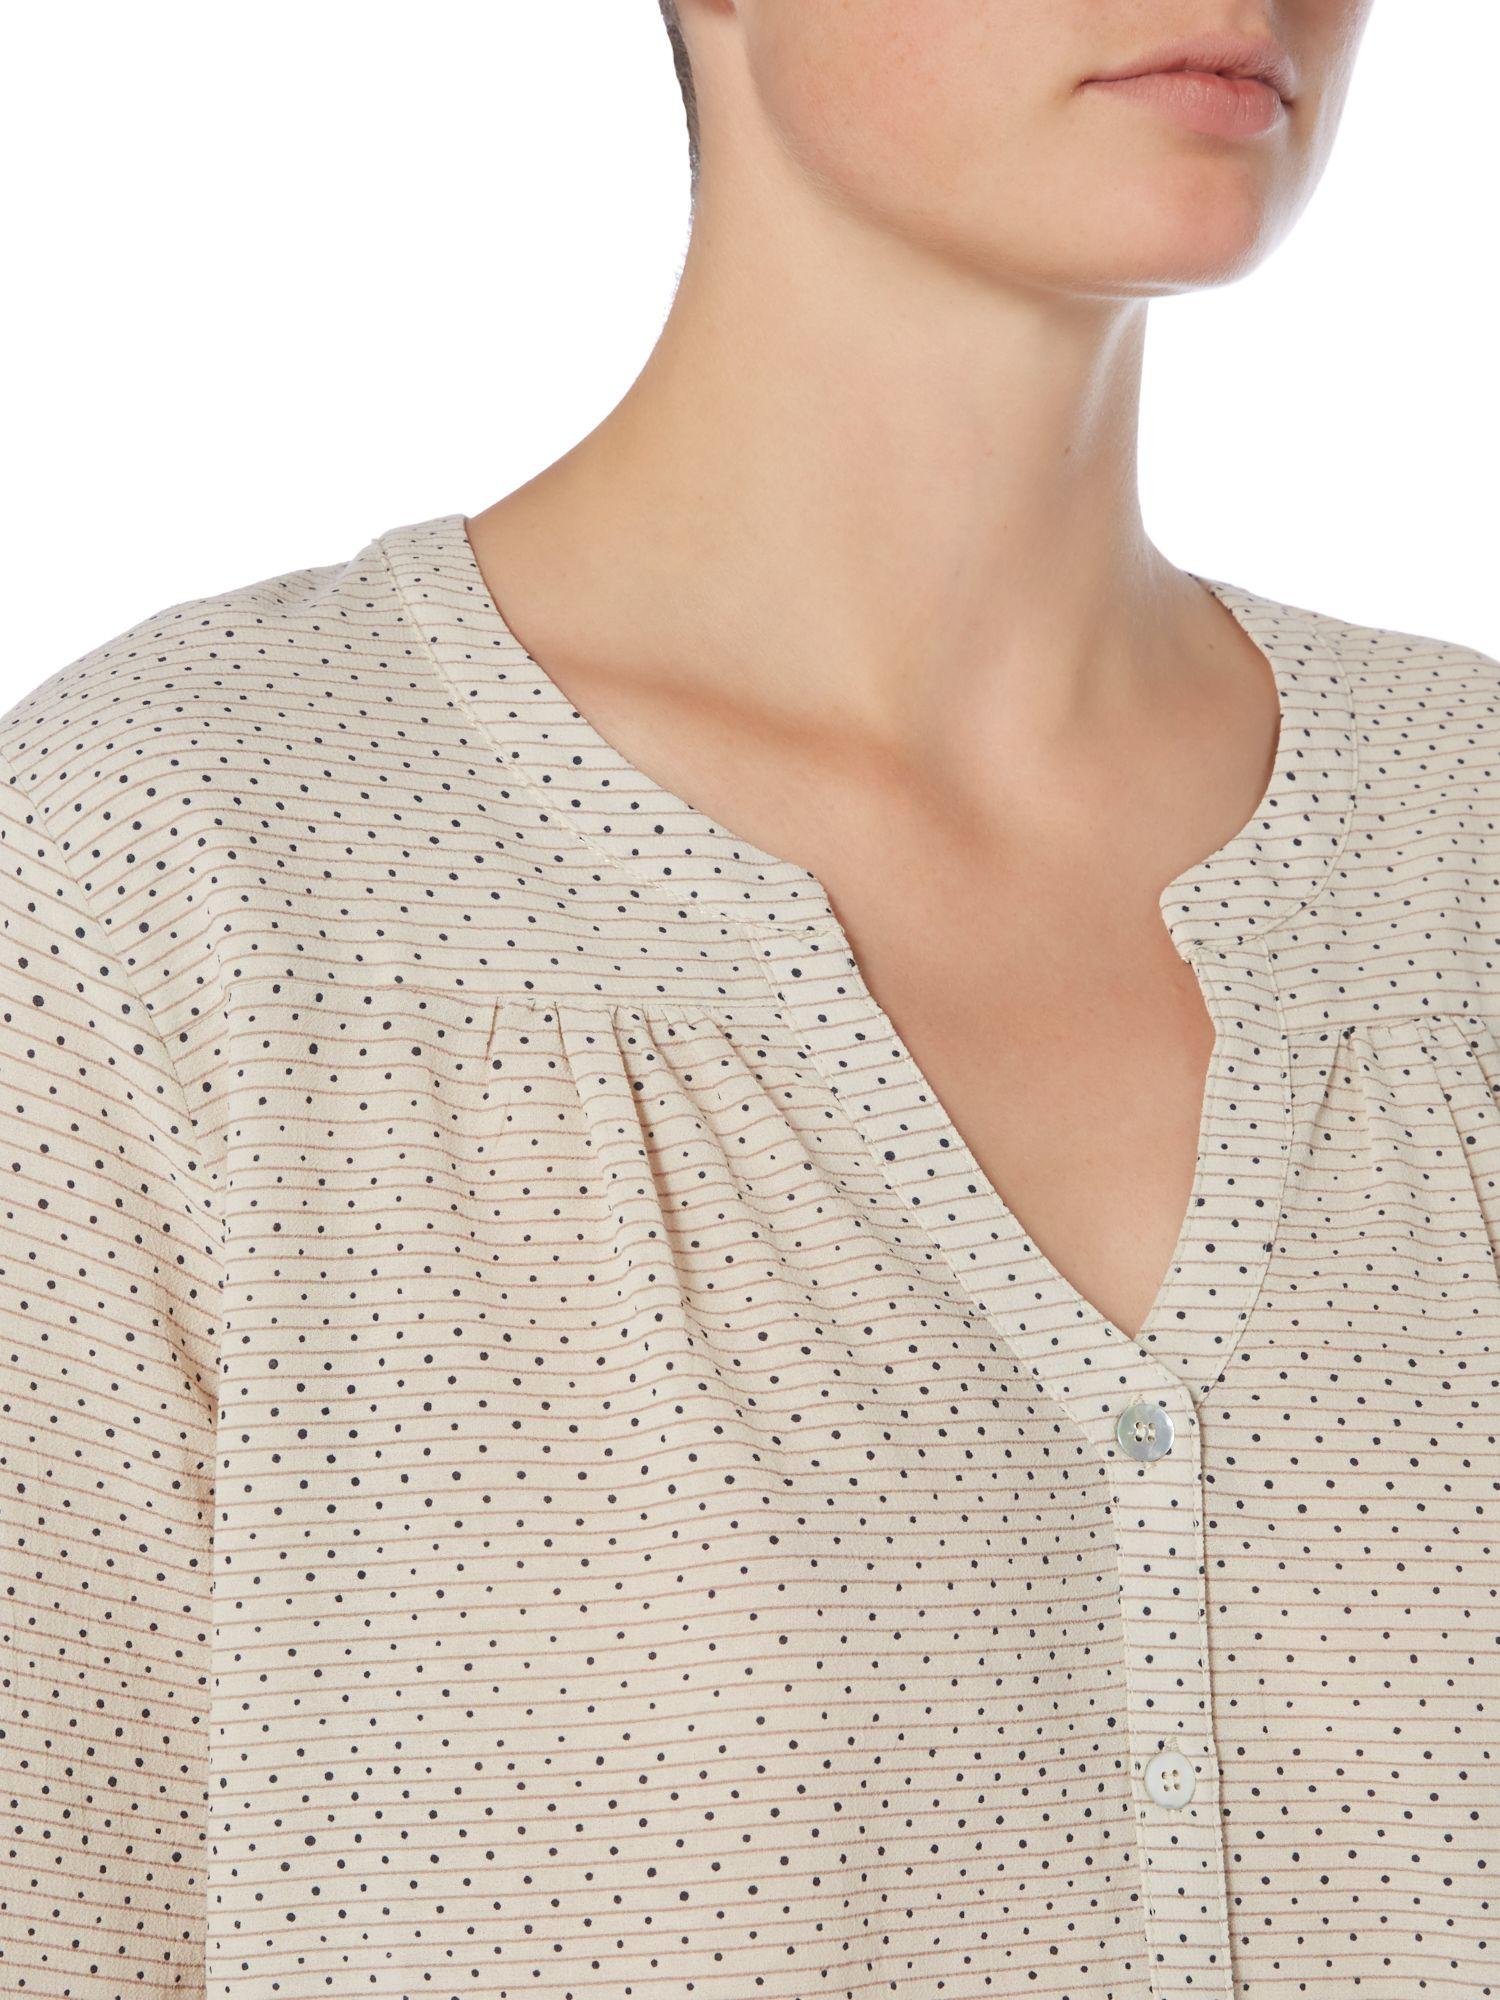 Braintree Cotton Artis Woven Blouse in Cream (Natural)